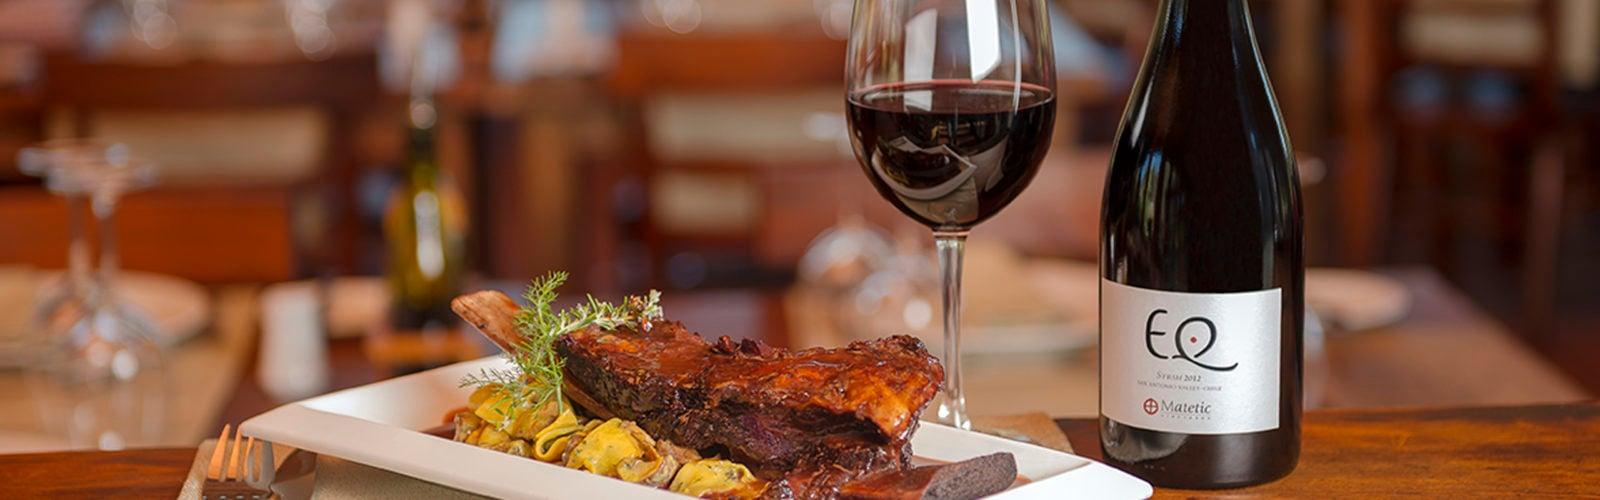 matetic-food-and-wine